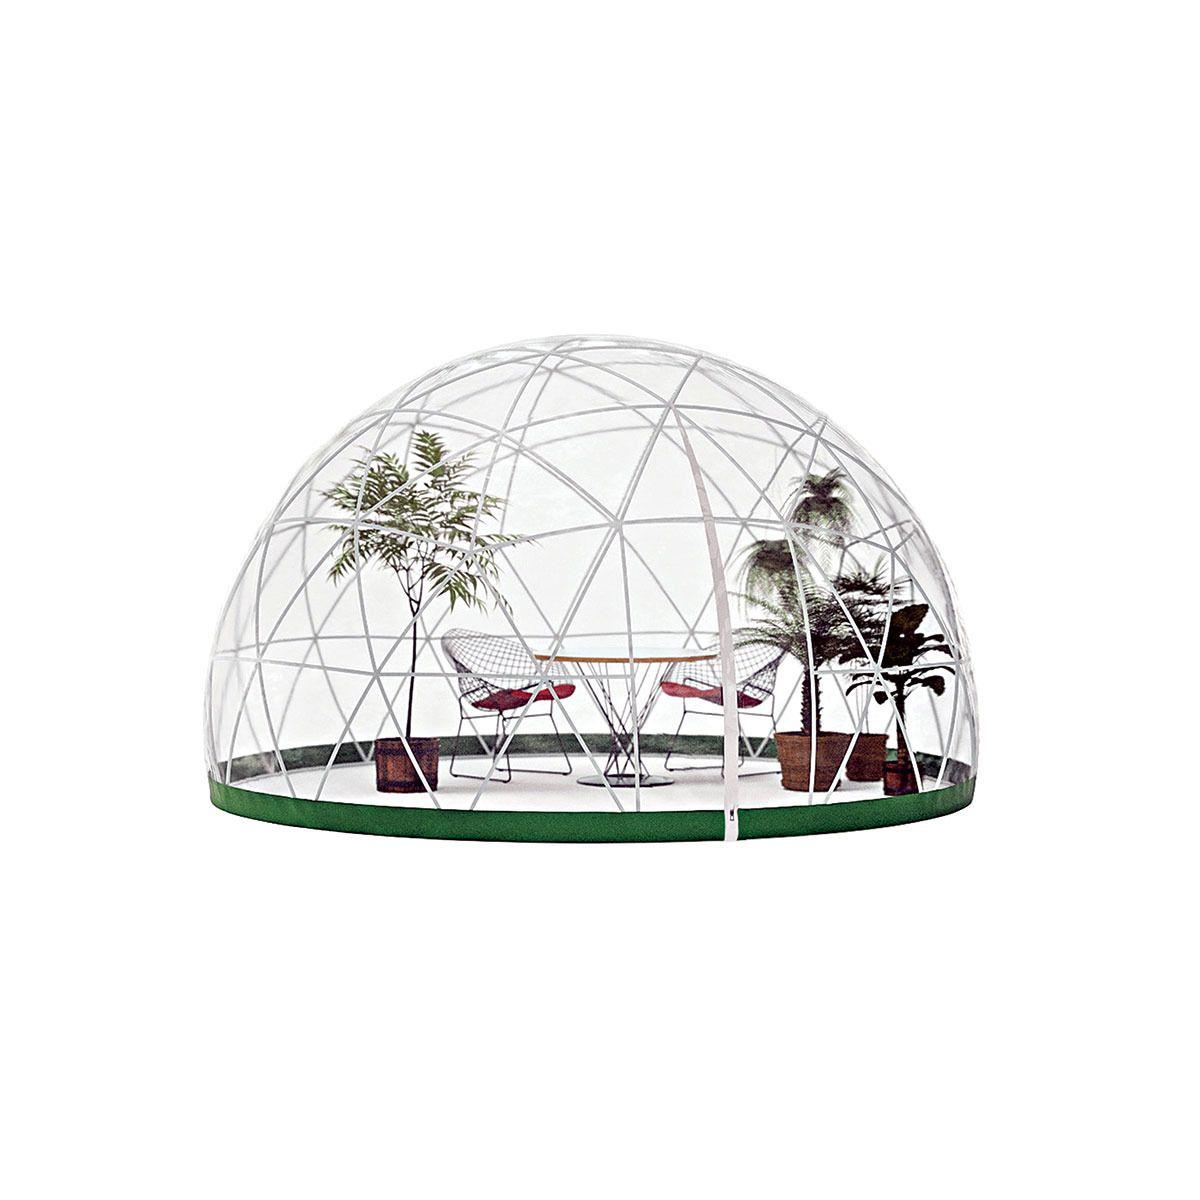 A Backyard Bubble - The Cut